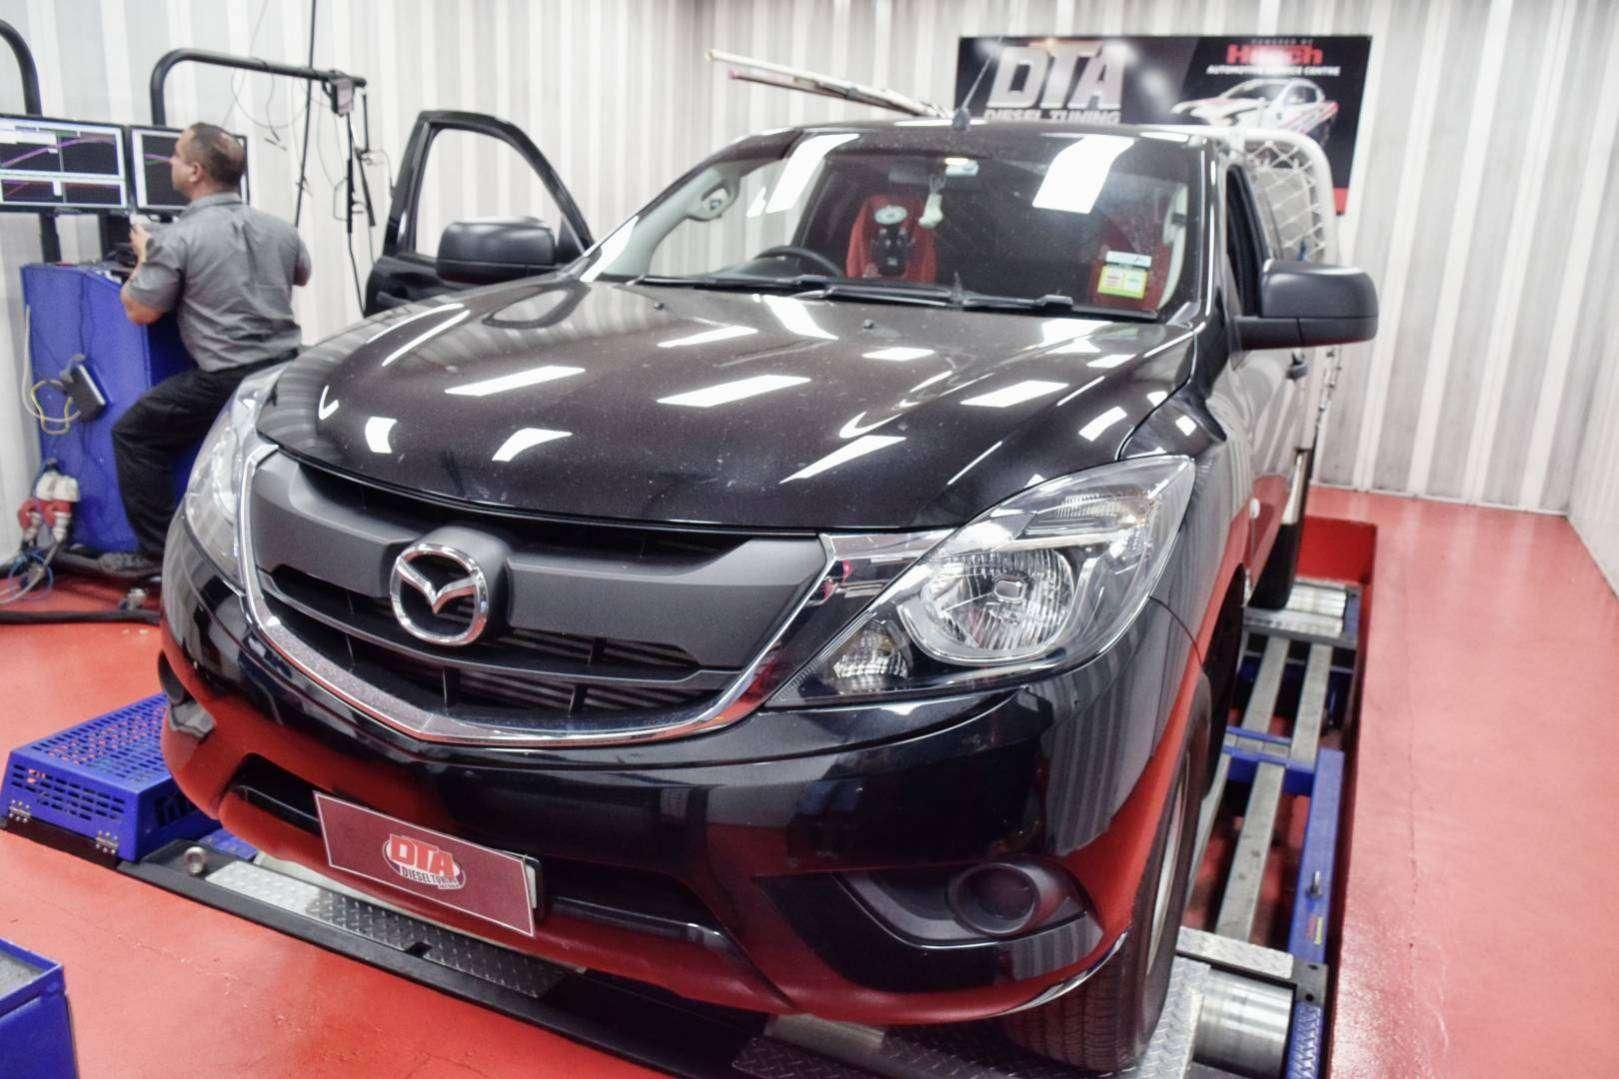 Amarok V6 Remap >> Mazda BT-50 2016 3.2 remap - Diesel Tuning Australia